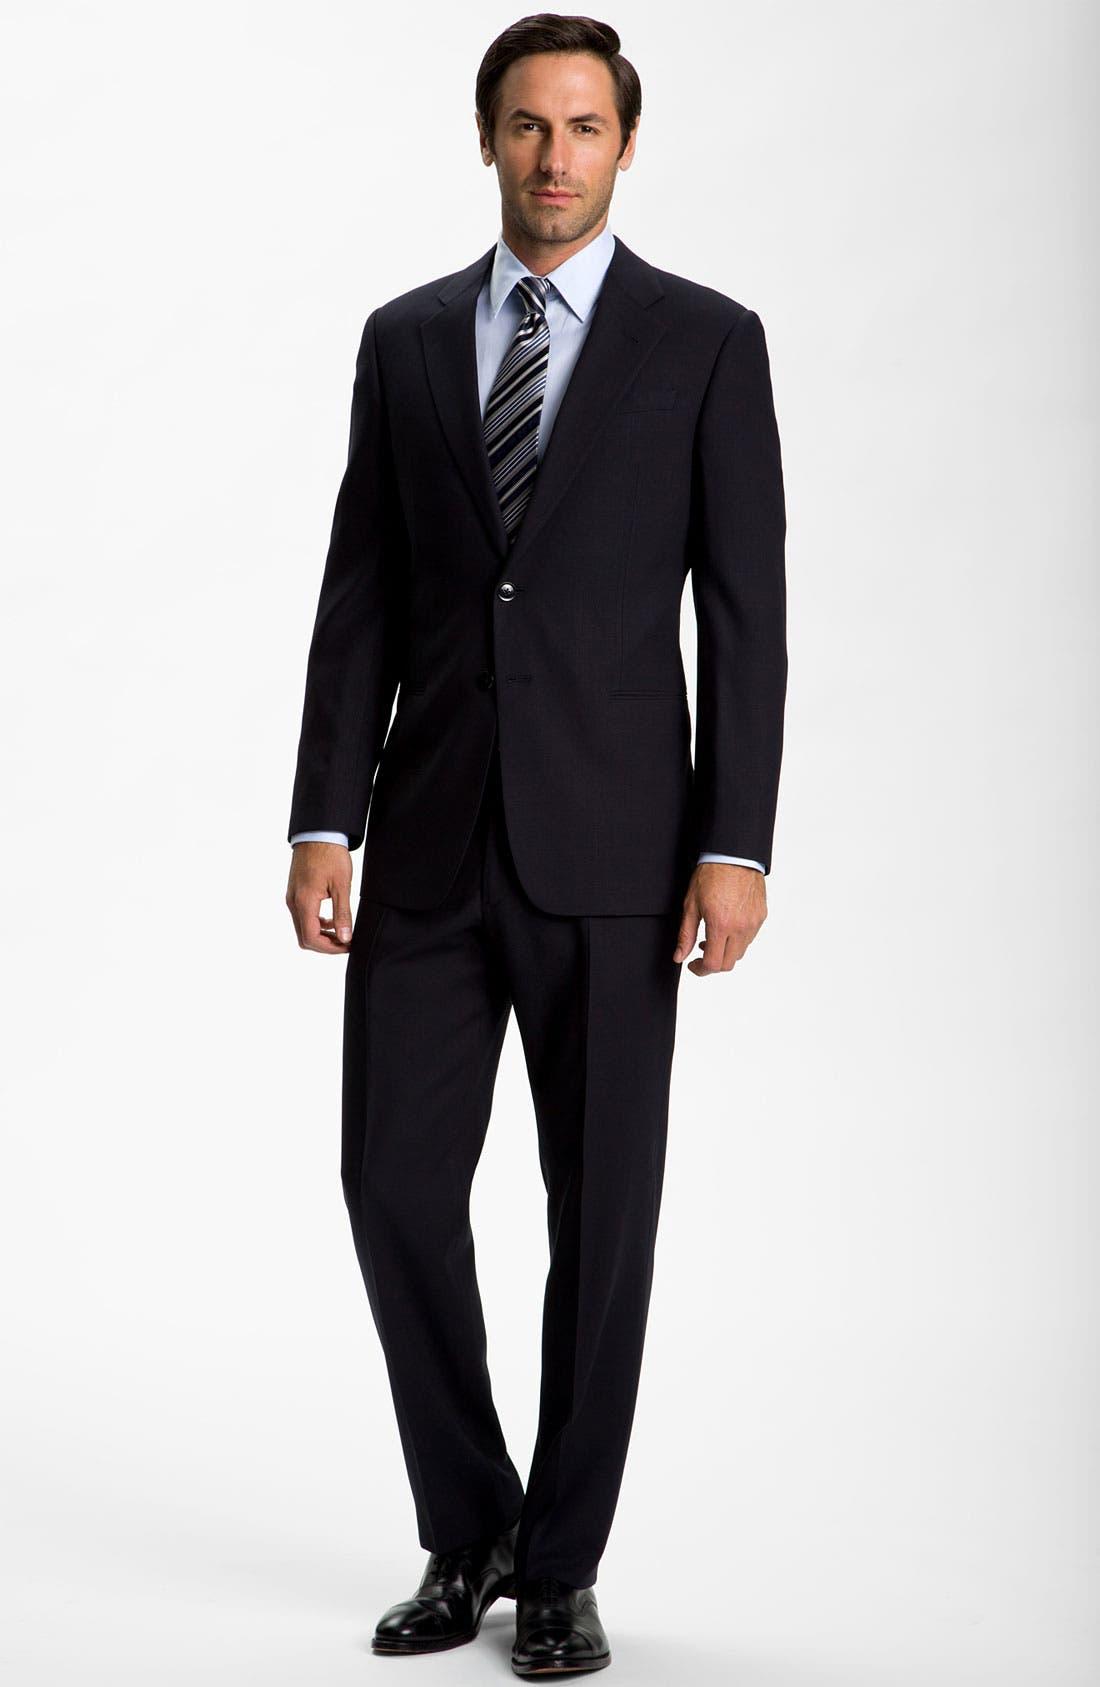 Alternate Image 1 Selected - Armani Collezioni Trim Fit Black Wool Suit